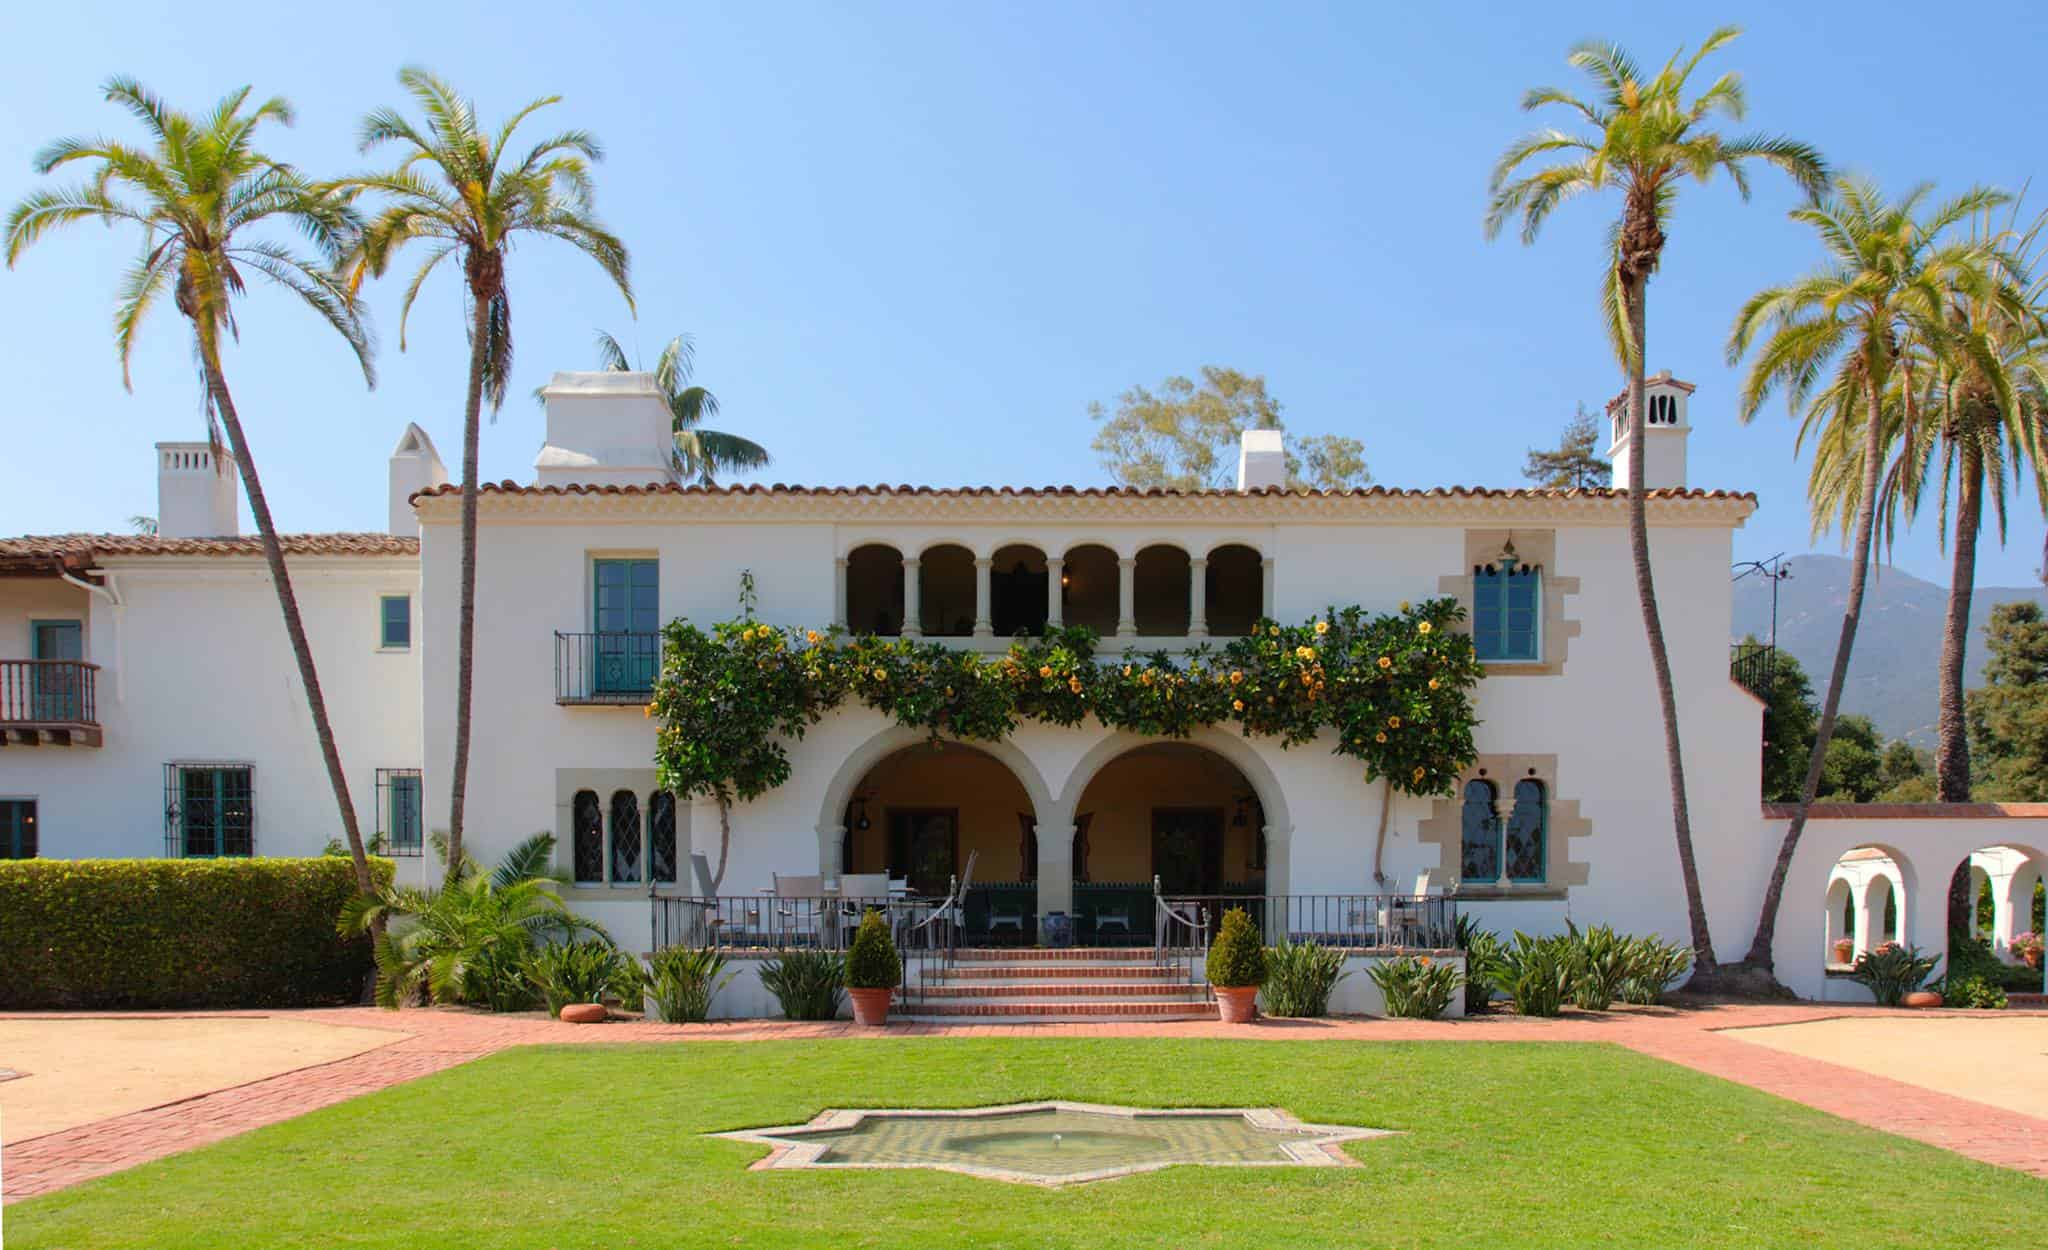 Casa Del Herrero: House of the Blacksmith